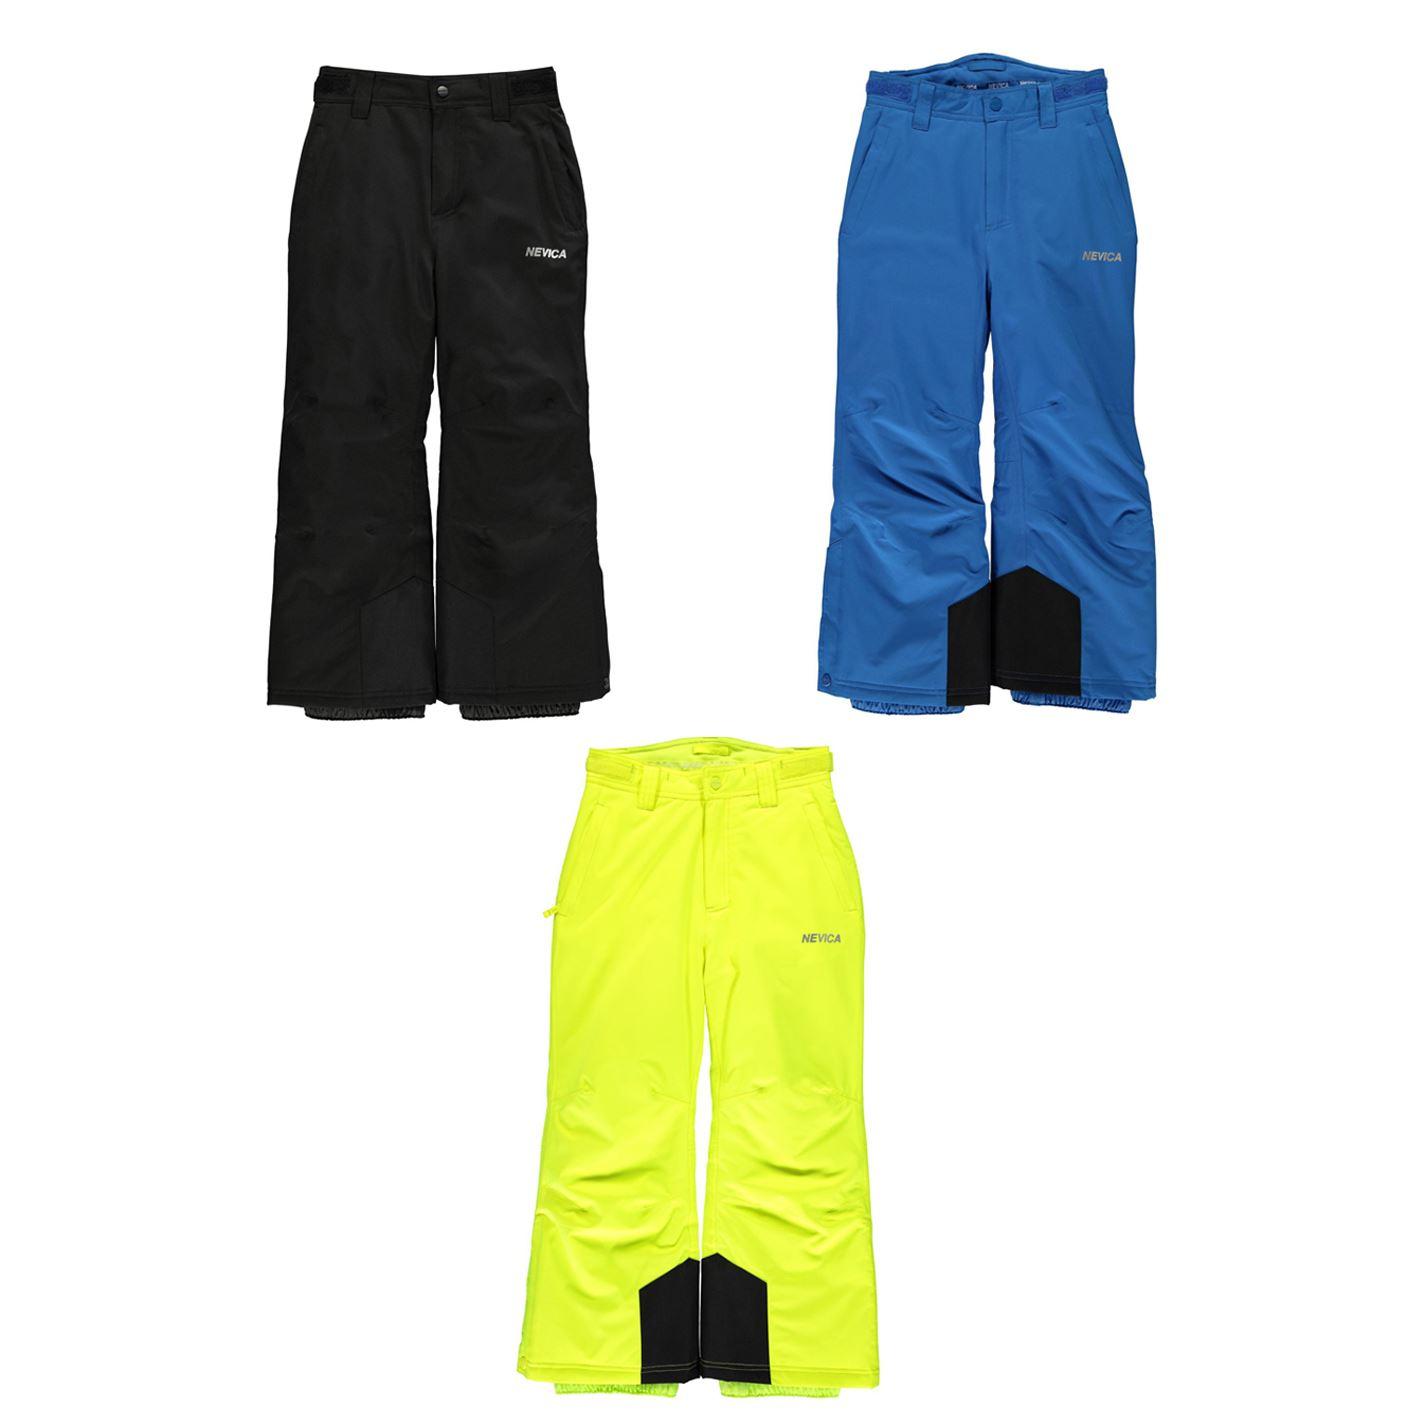 ... Nevica Meribel Ski Pants Junior Boys Snow Salopettes Trousers ... 3c9cad8aab4